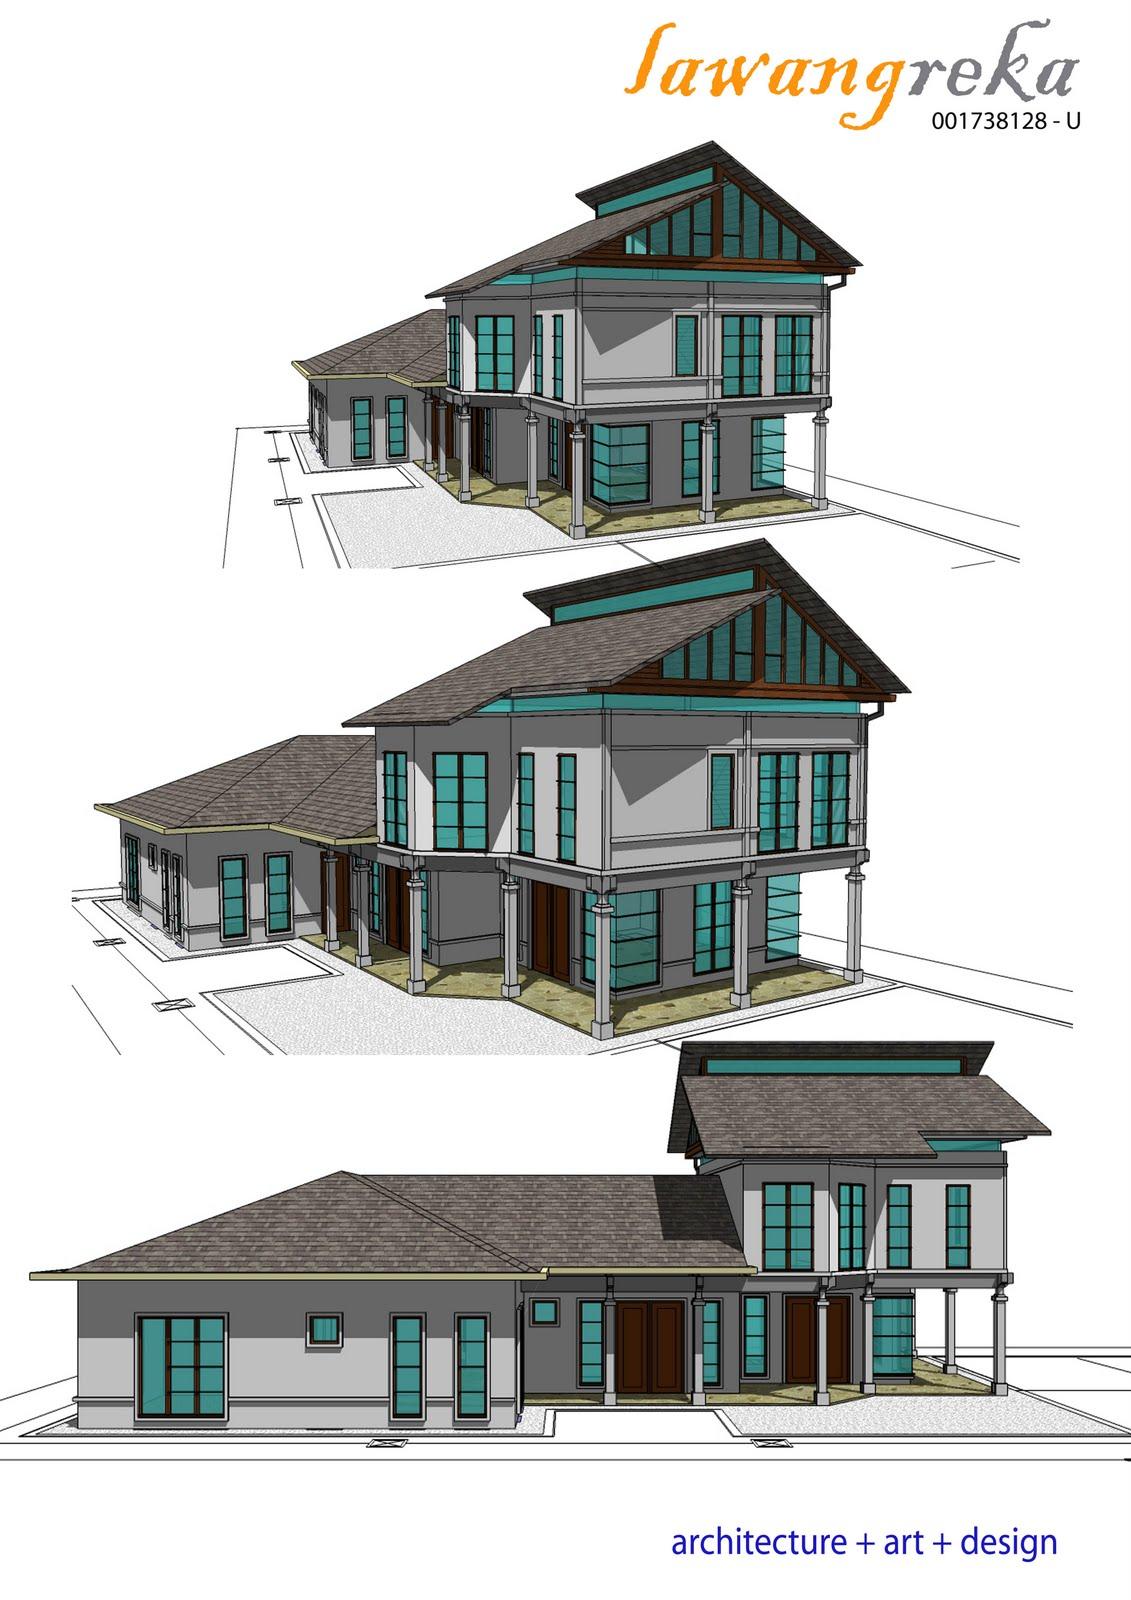 Pelan Rumah Kampung Bertiang